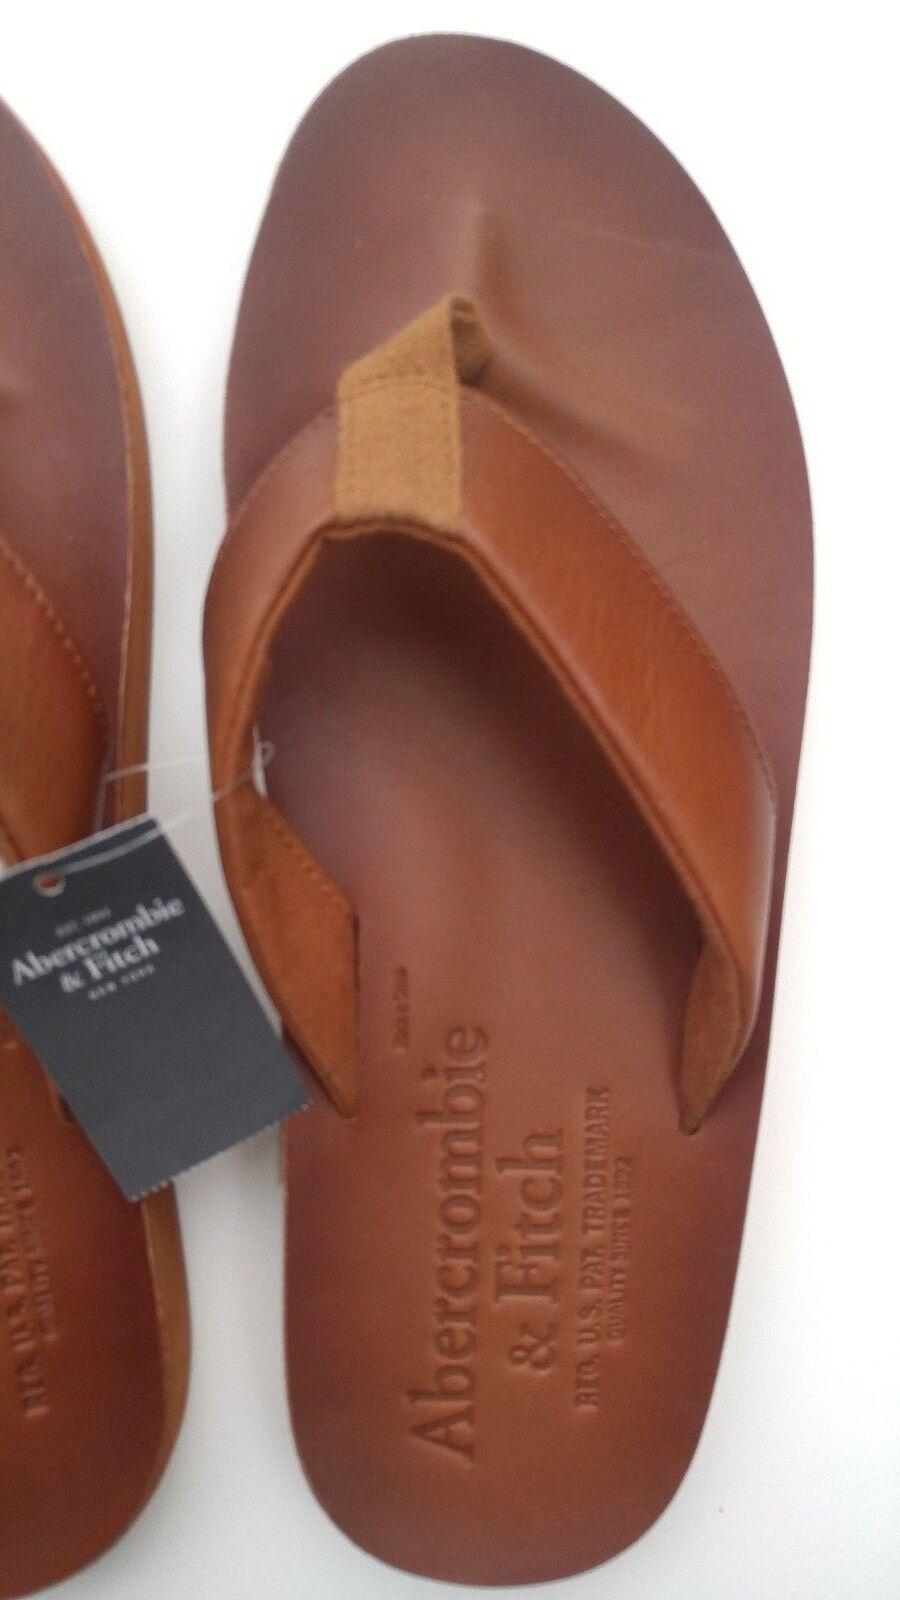 ddd3f861caf NEW Abercrombie   Fitch Leather Flip Flops Flops Flops - Men s size L Large  SAVE!